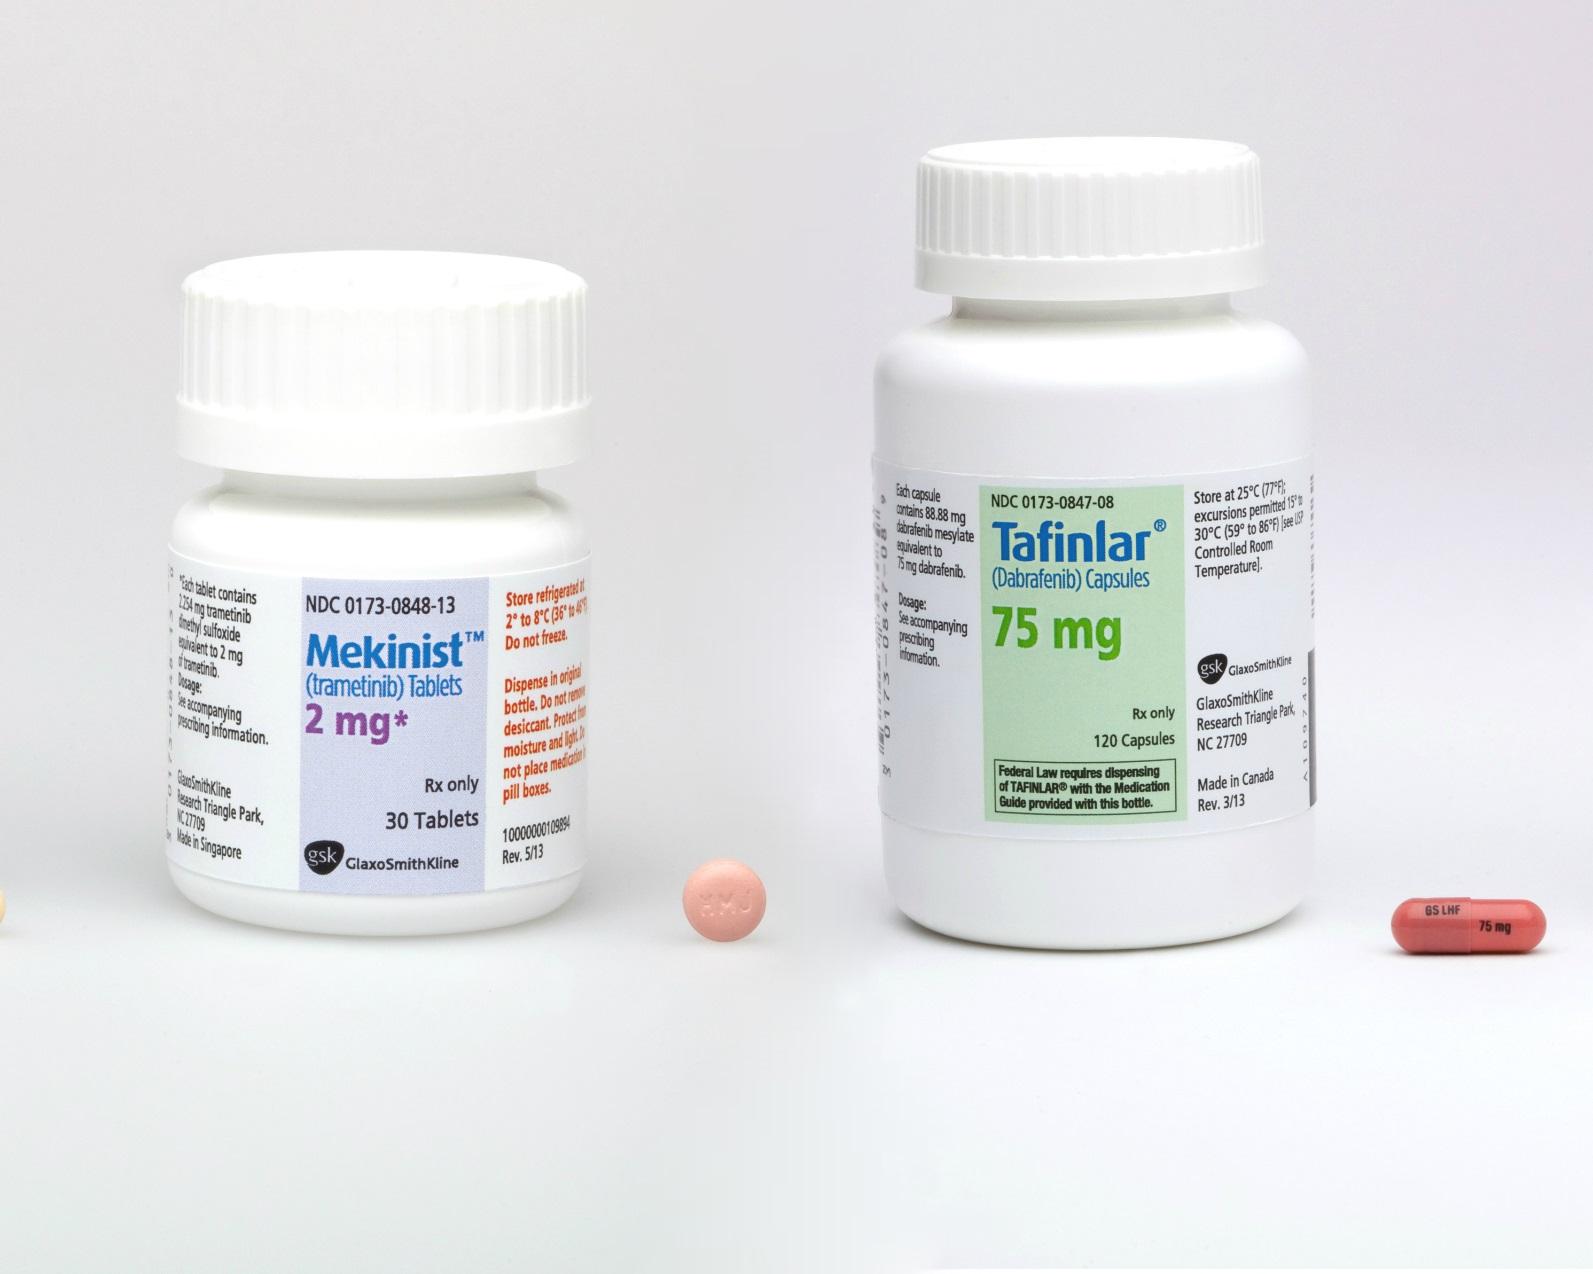 «Тафинлар» (Tafinlar, дабрафениб) и «Мекинист» (Mekinist, траметиниб).